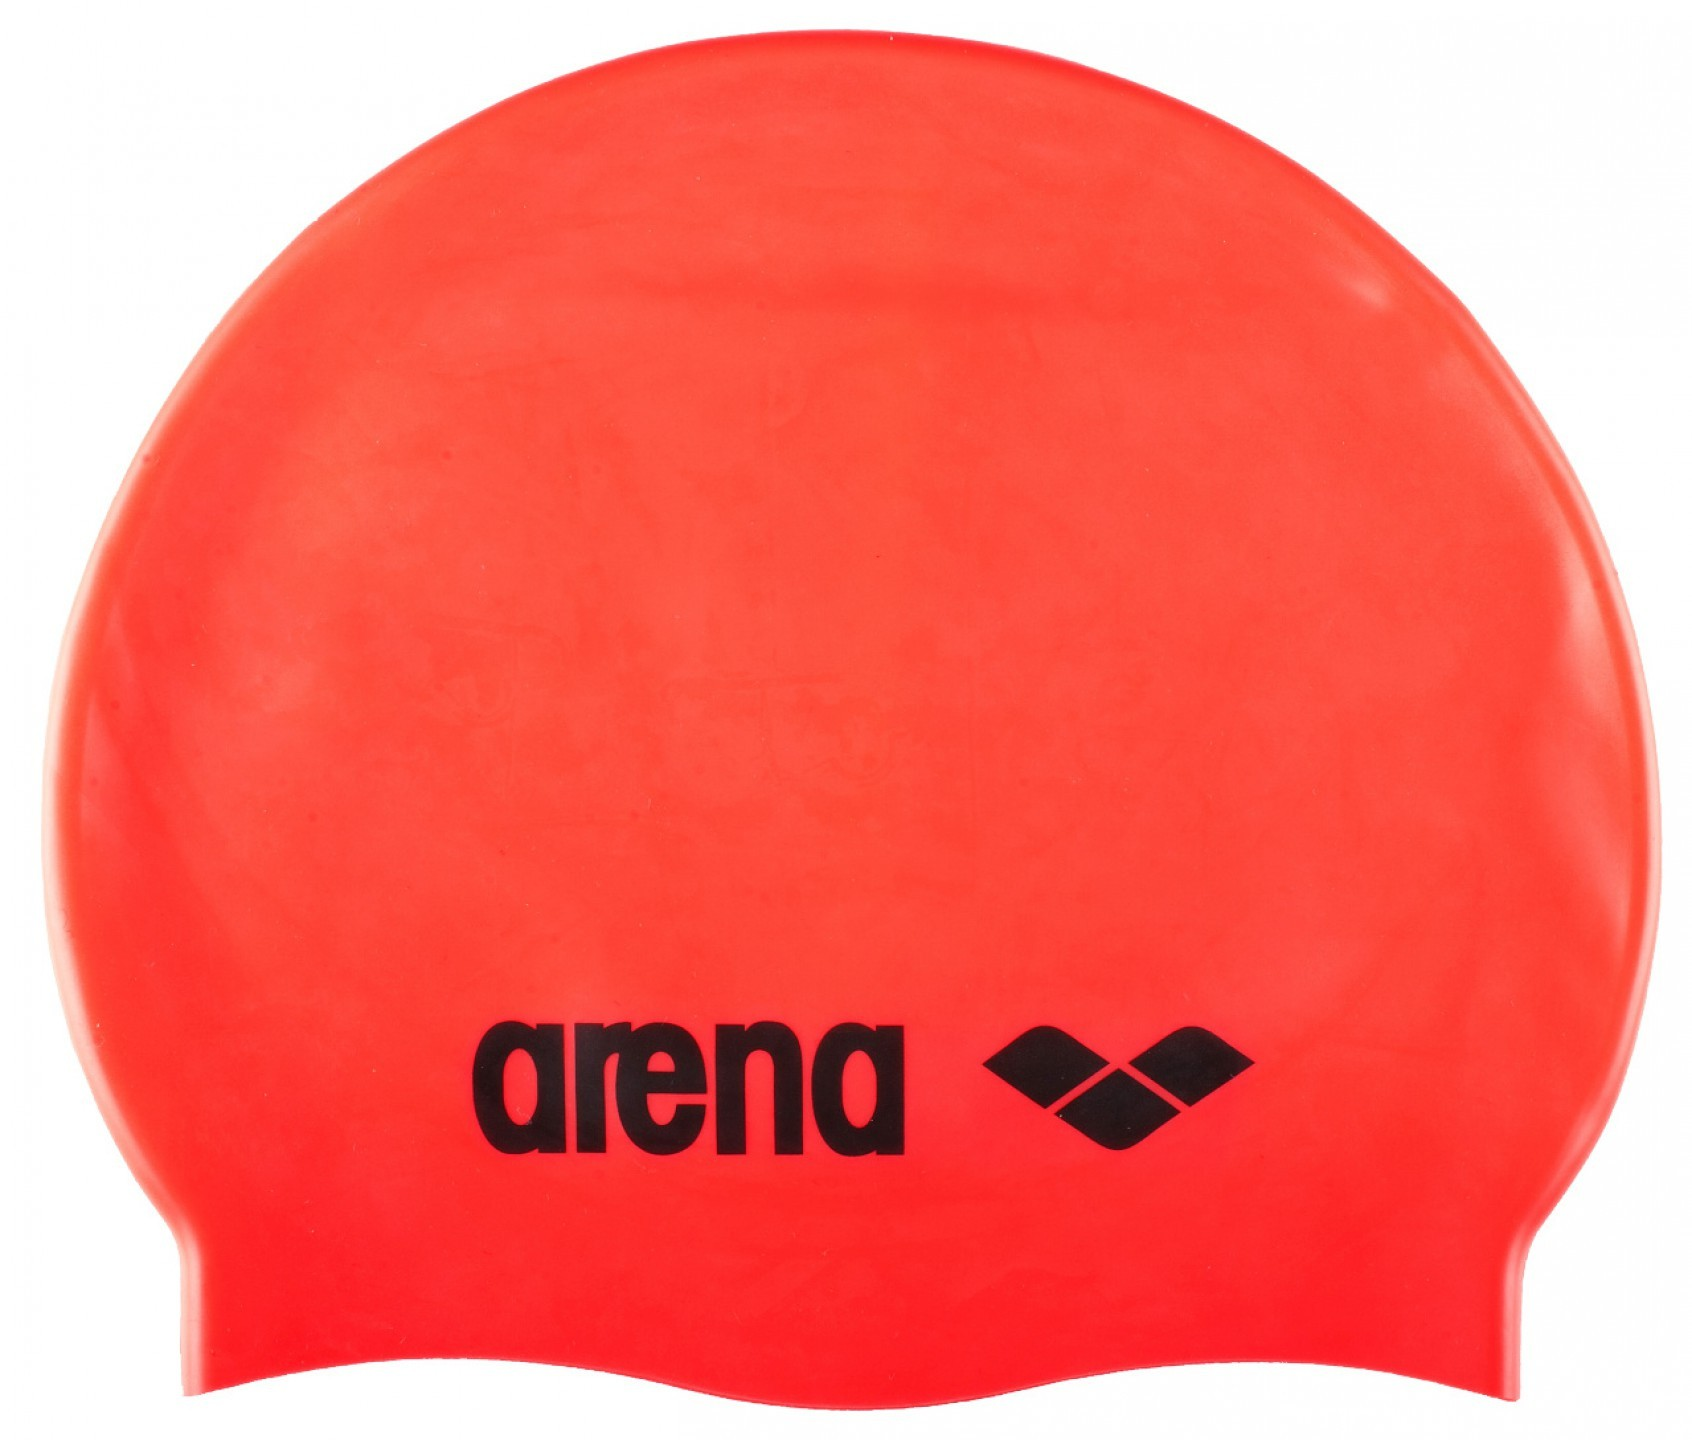 Arena badmuts classic silicone fluo-red, black